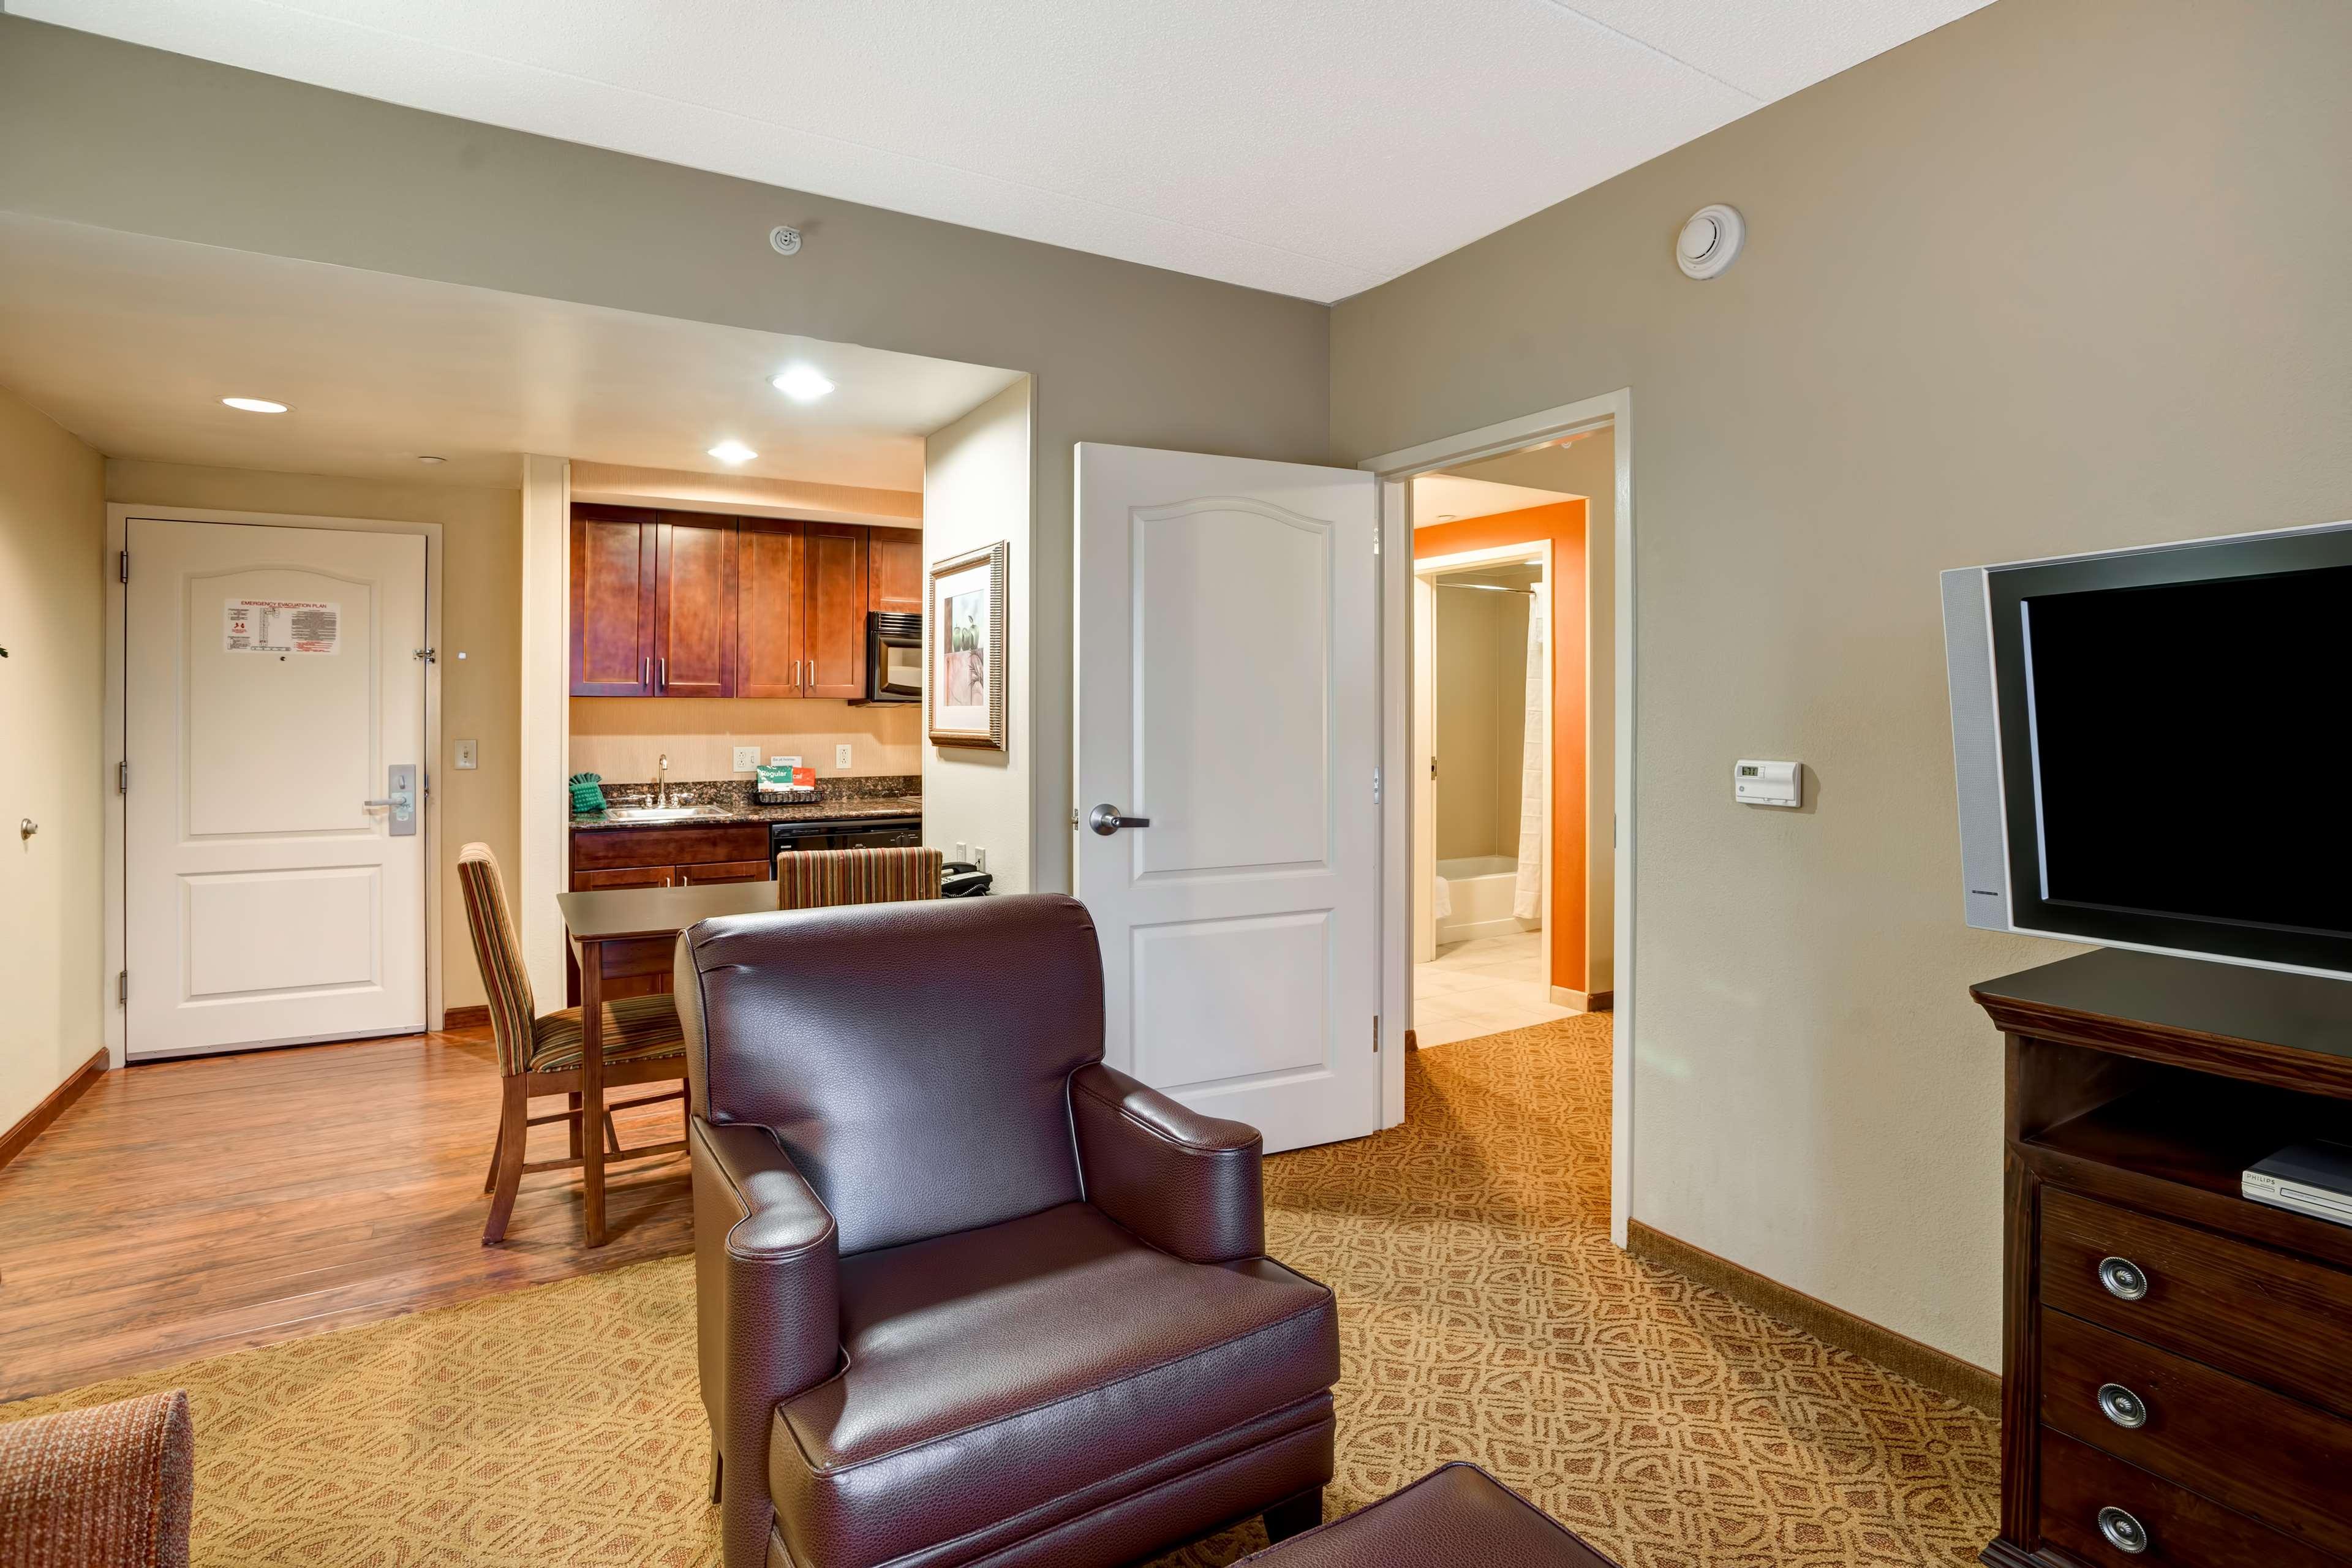 Homewood Suites by Hilton Fredericksburg image 41